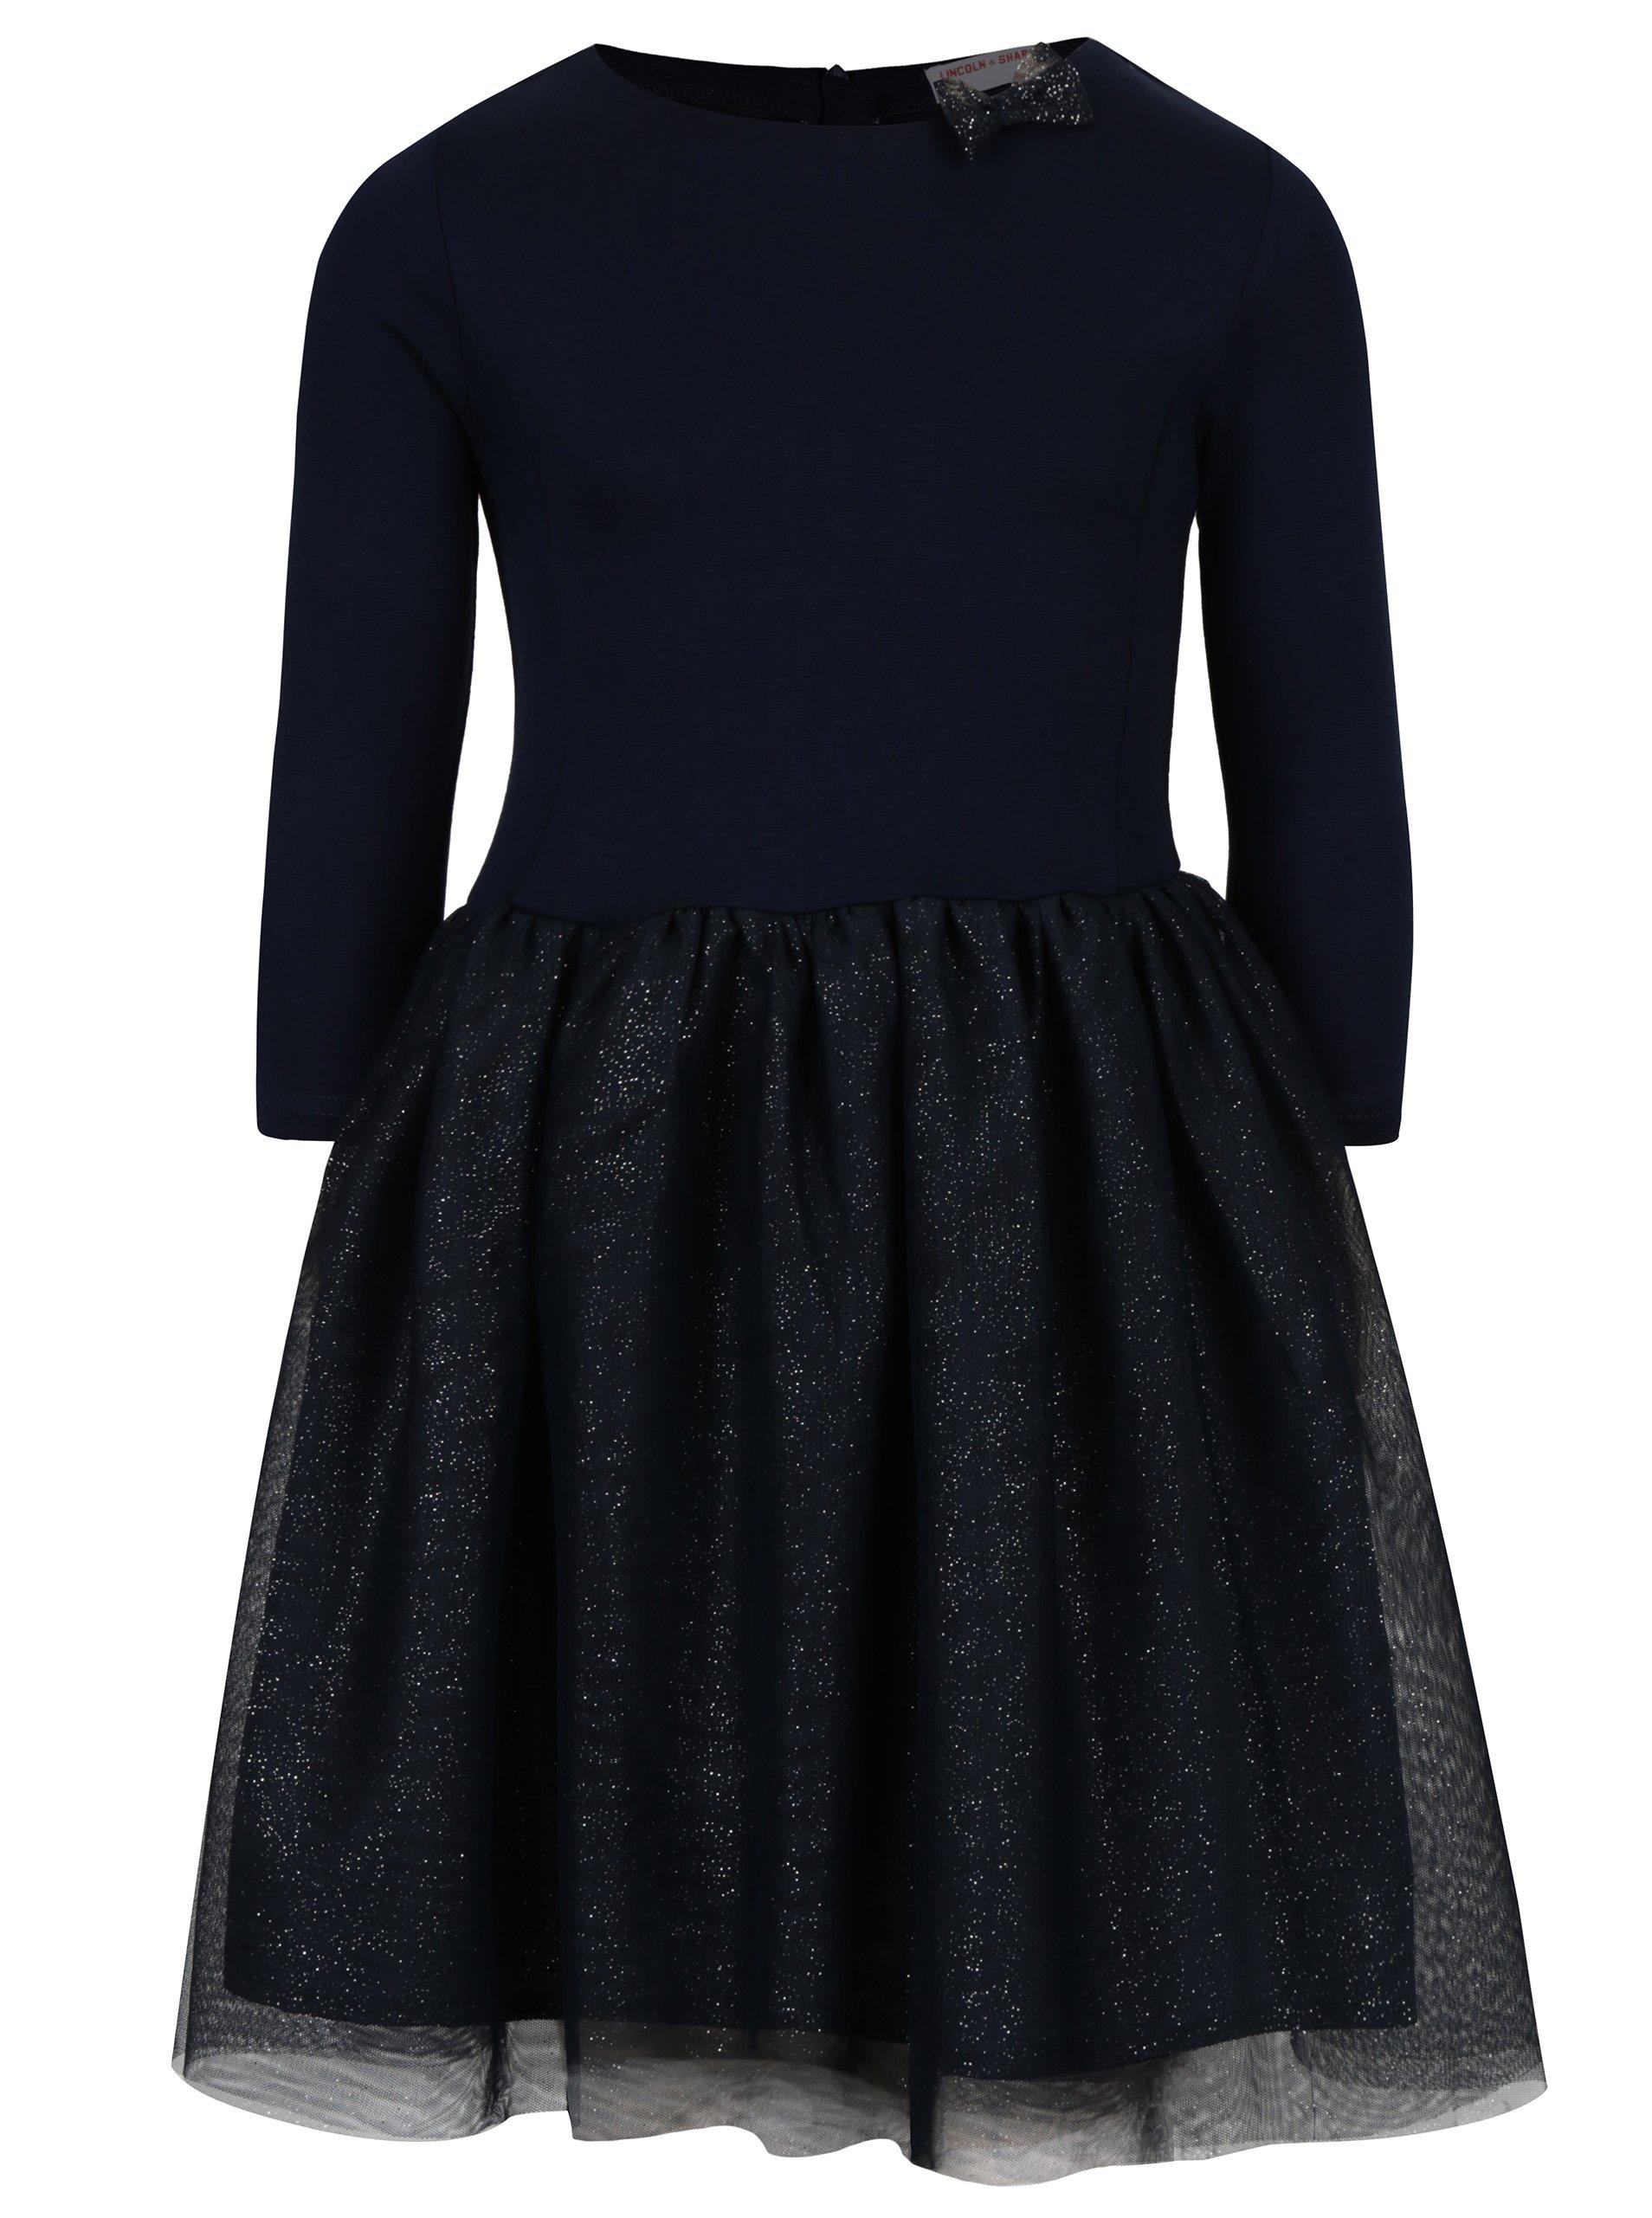 Tmavomodré dievčenské šaty s trblietavou tylovou sukňou 5.10.15.